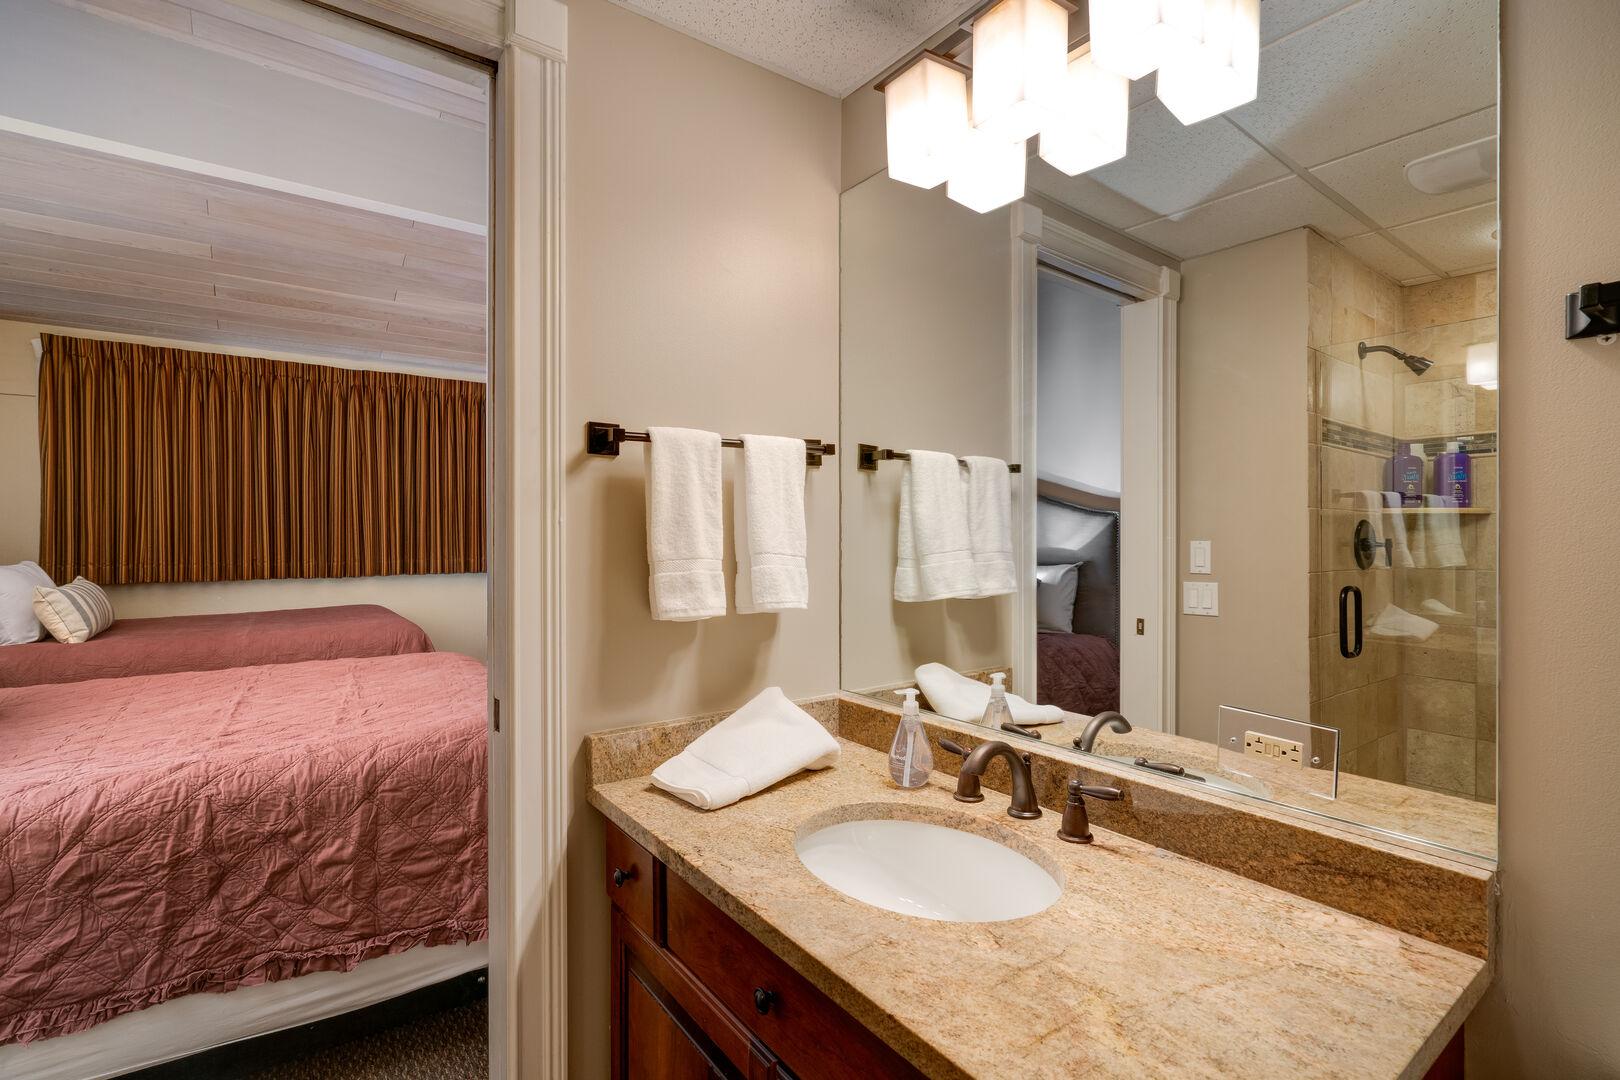 Ensuite bath in bedroom 1.